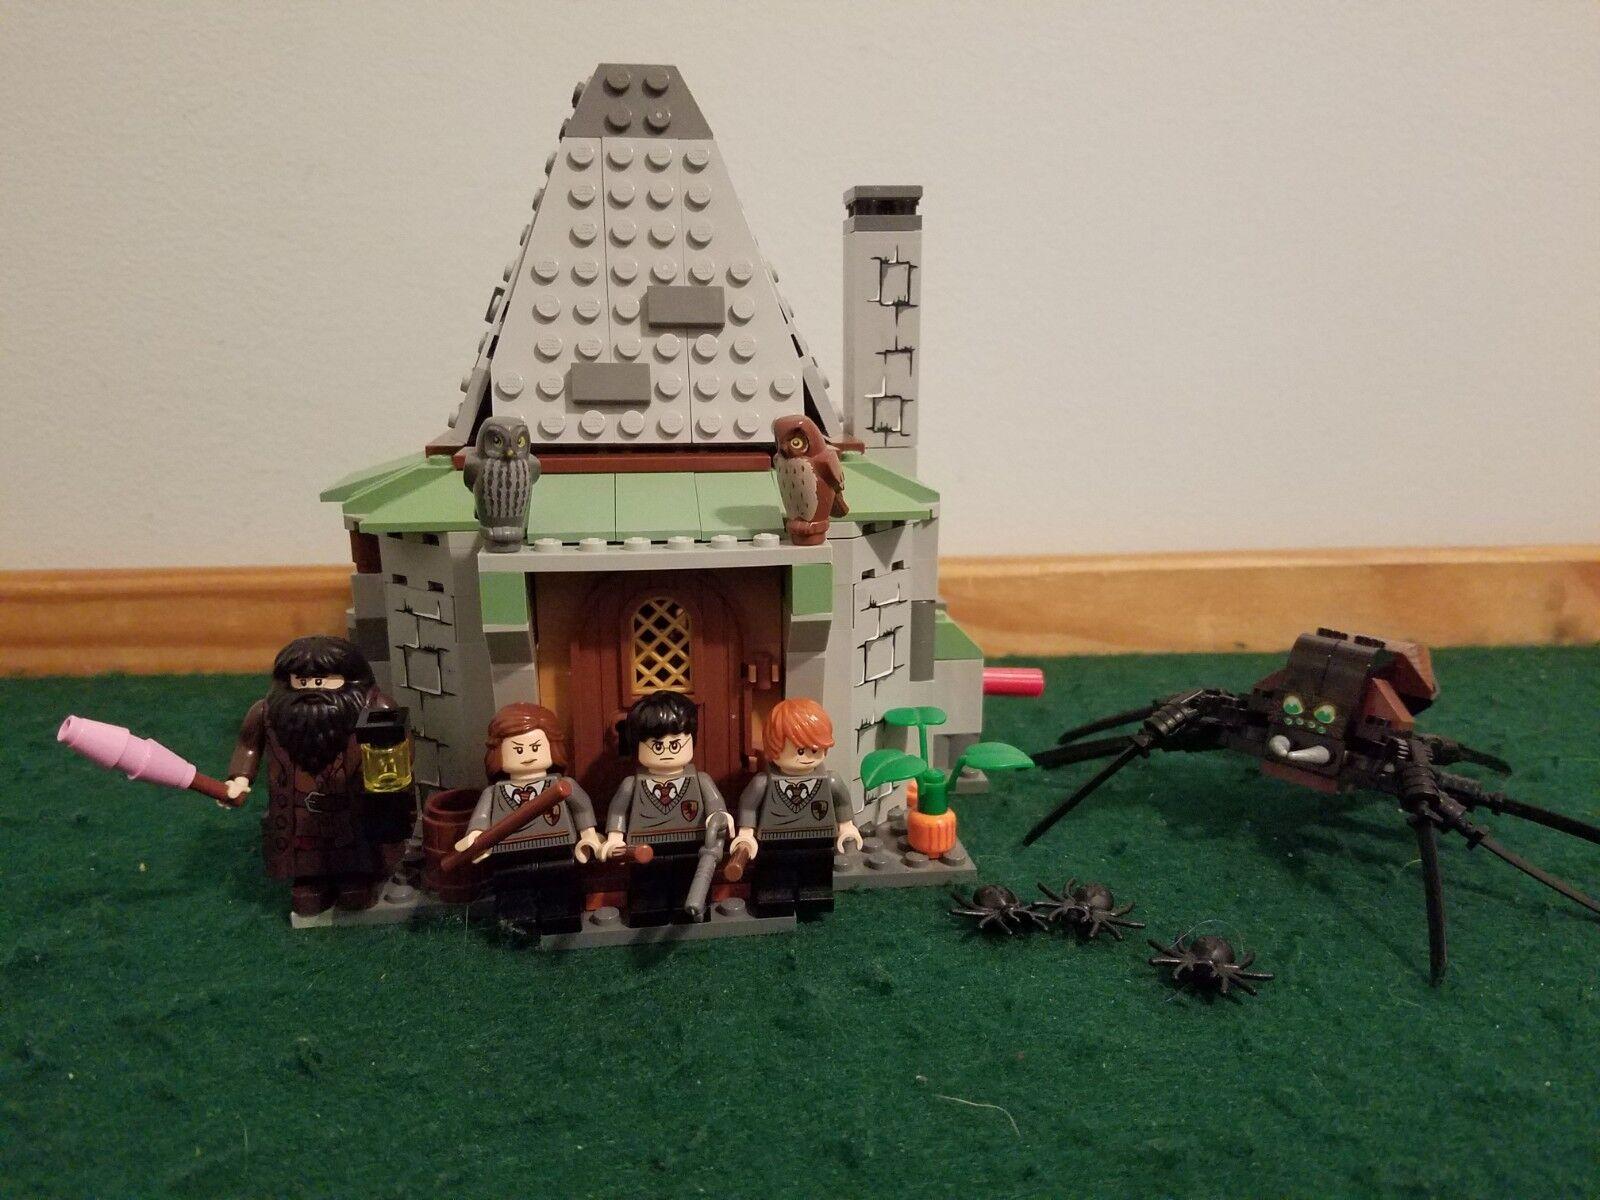 Harry Potter Lego Set 4738 Hagrid's Hut – Complete w  Minifigs